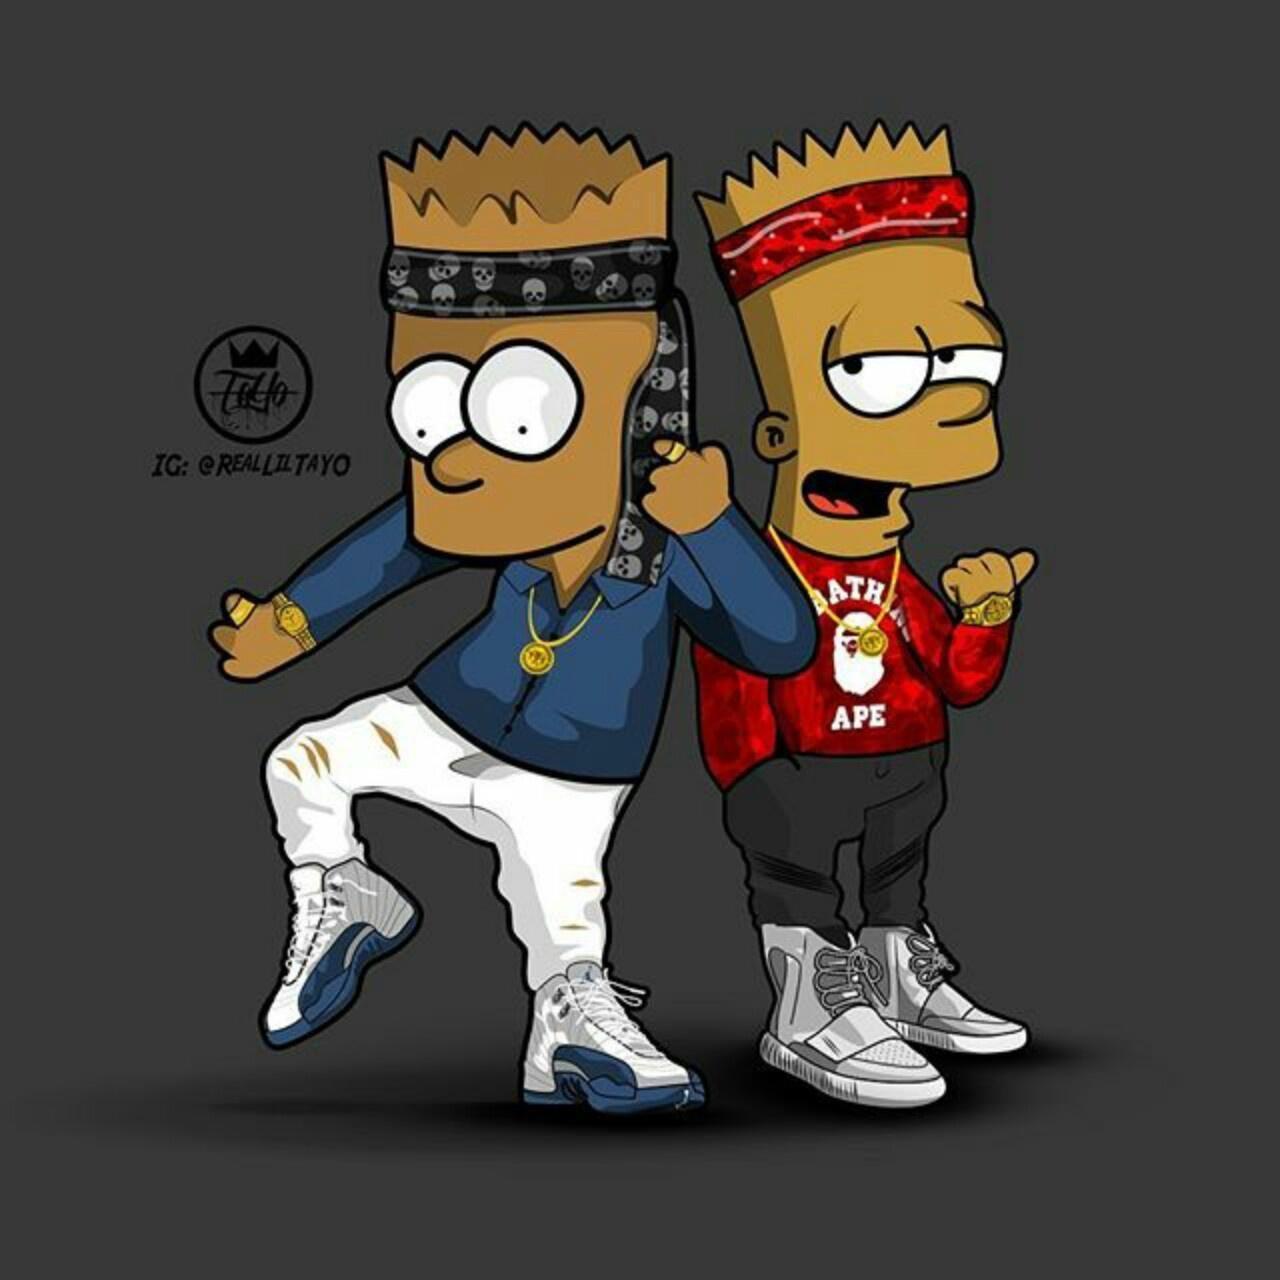 Black Bart Simpson Wallpapers Top Free Black Bart Simpson